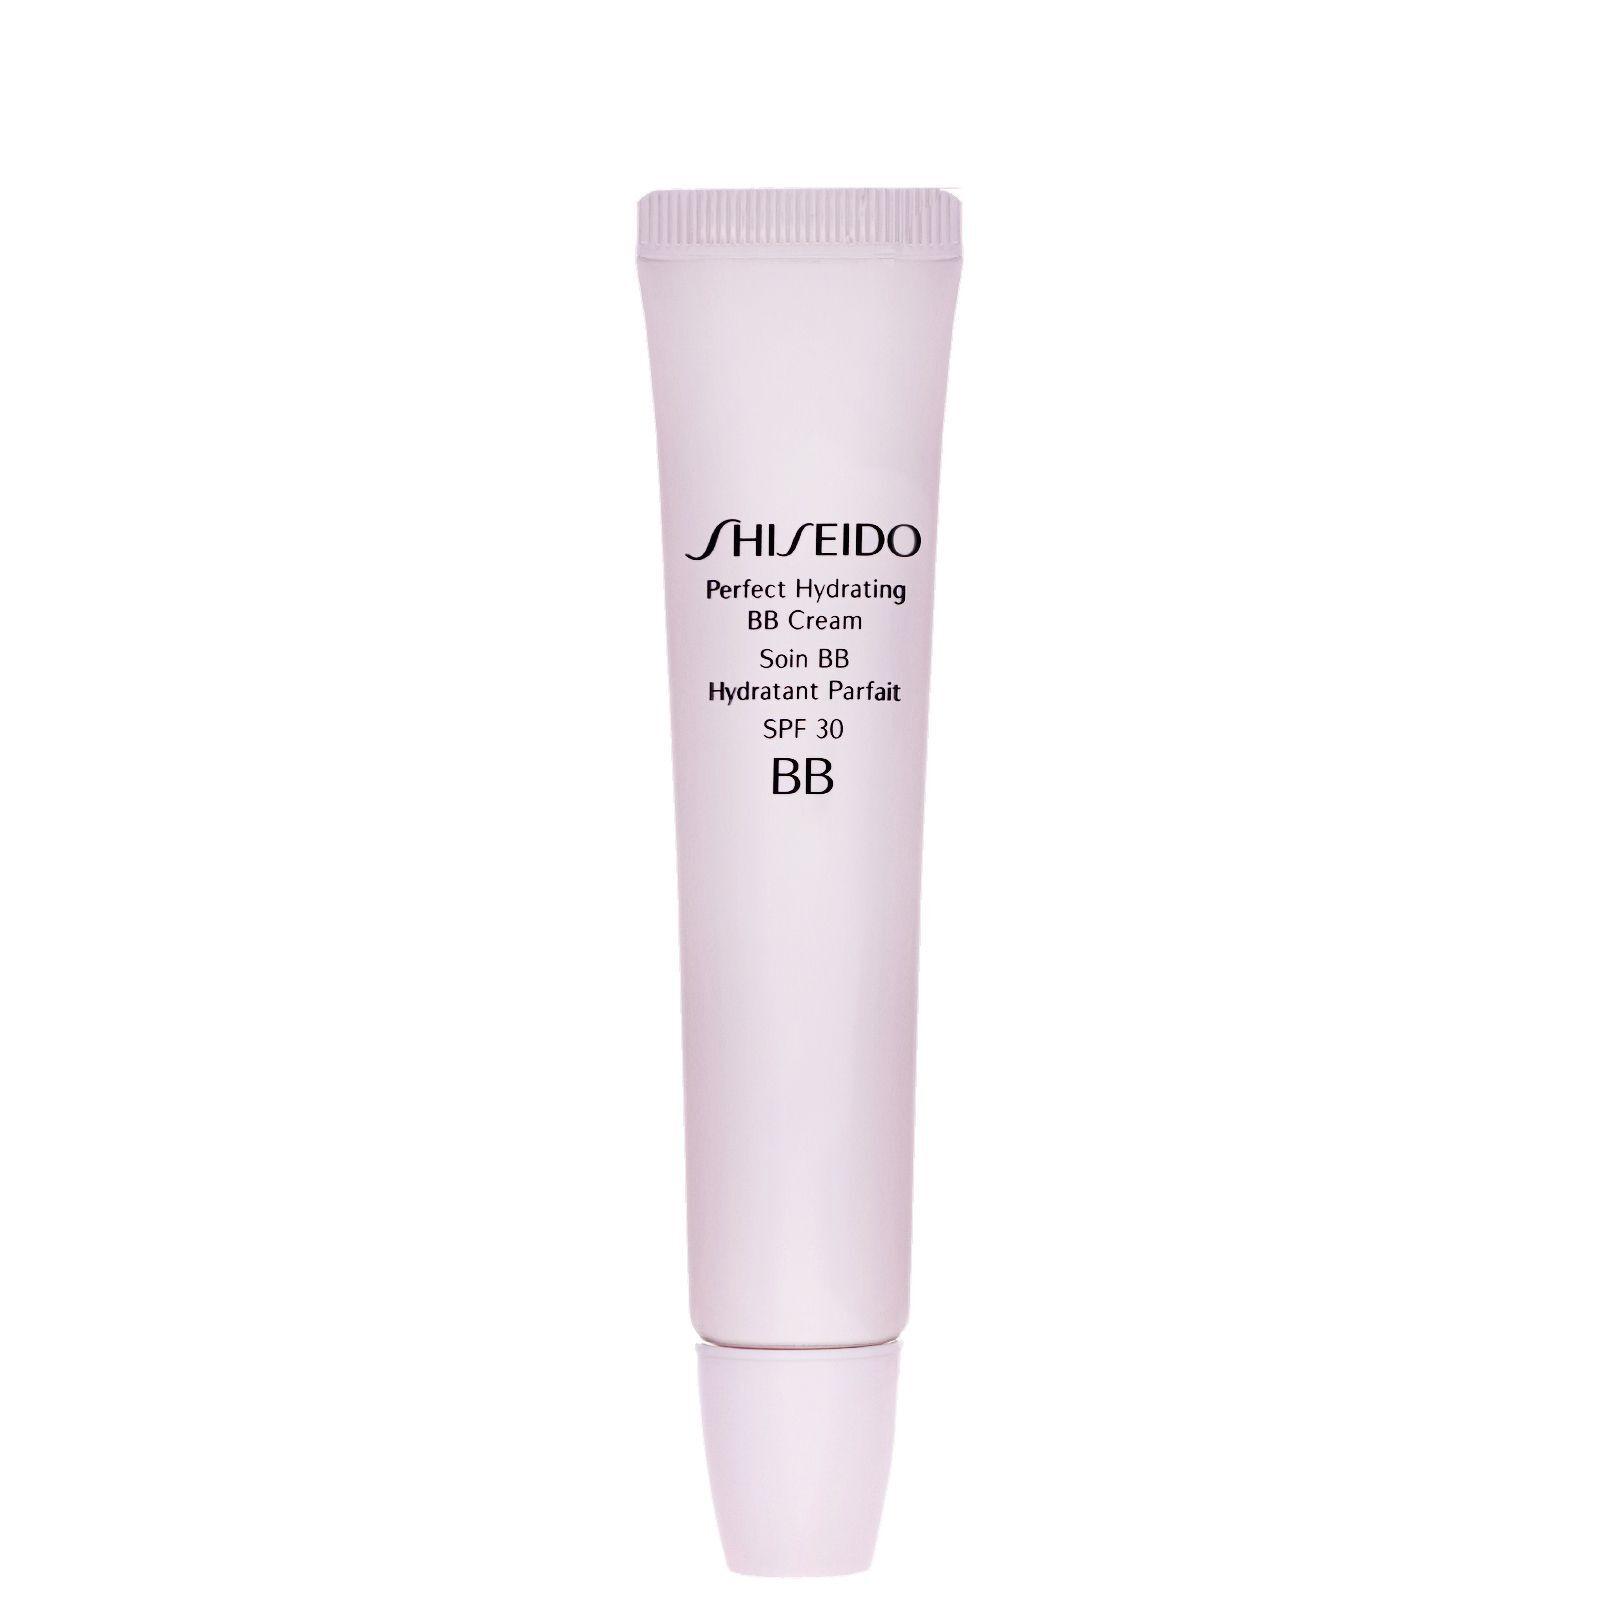 Shiseido Perfect Hydrating BB Cream SPF30 scuro 30ml/1.1 oz.